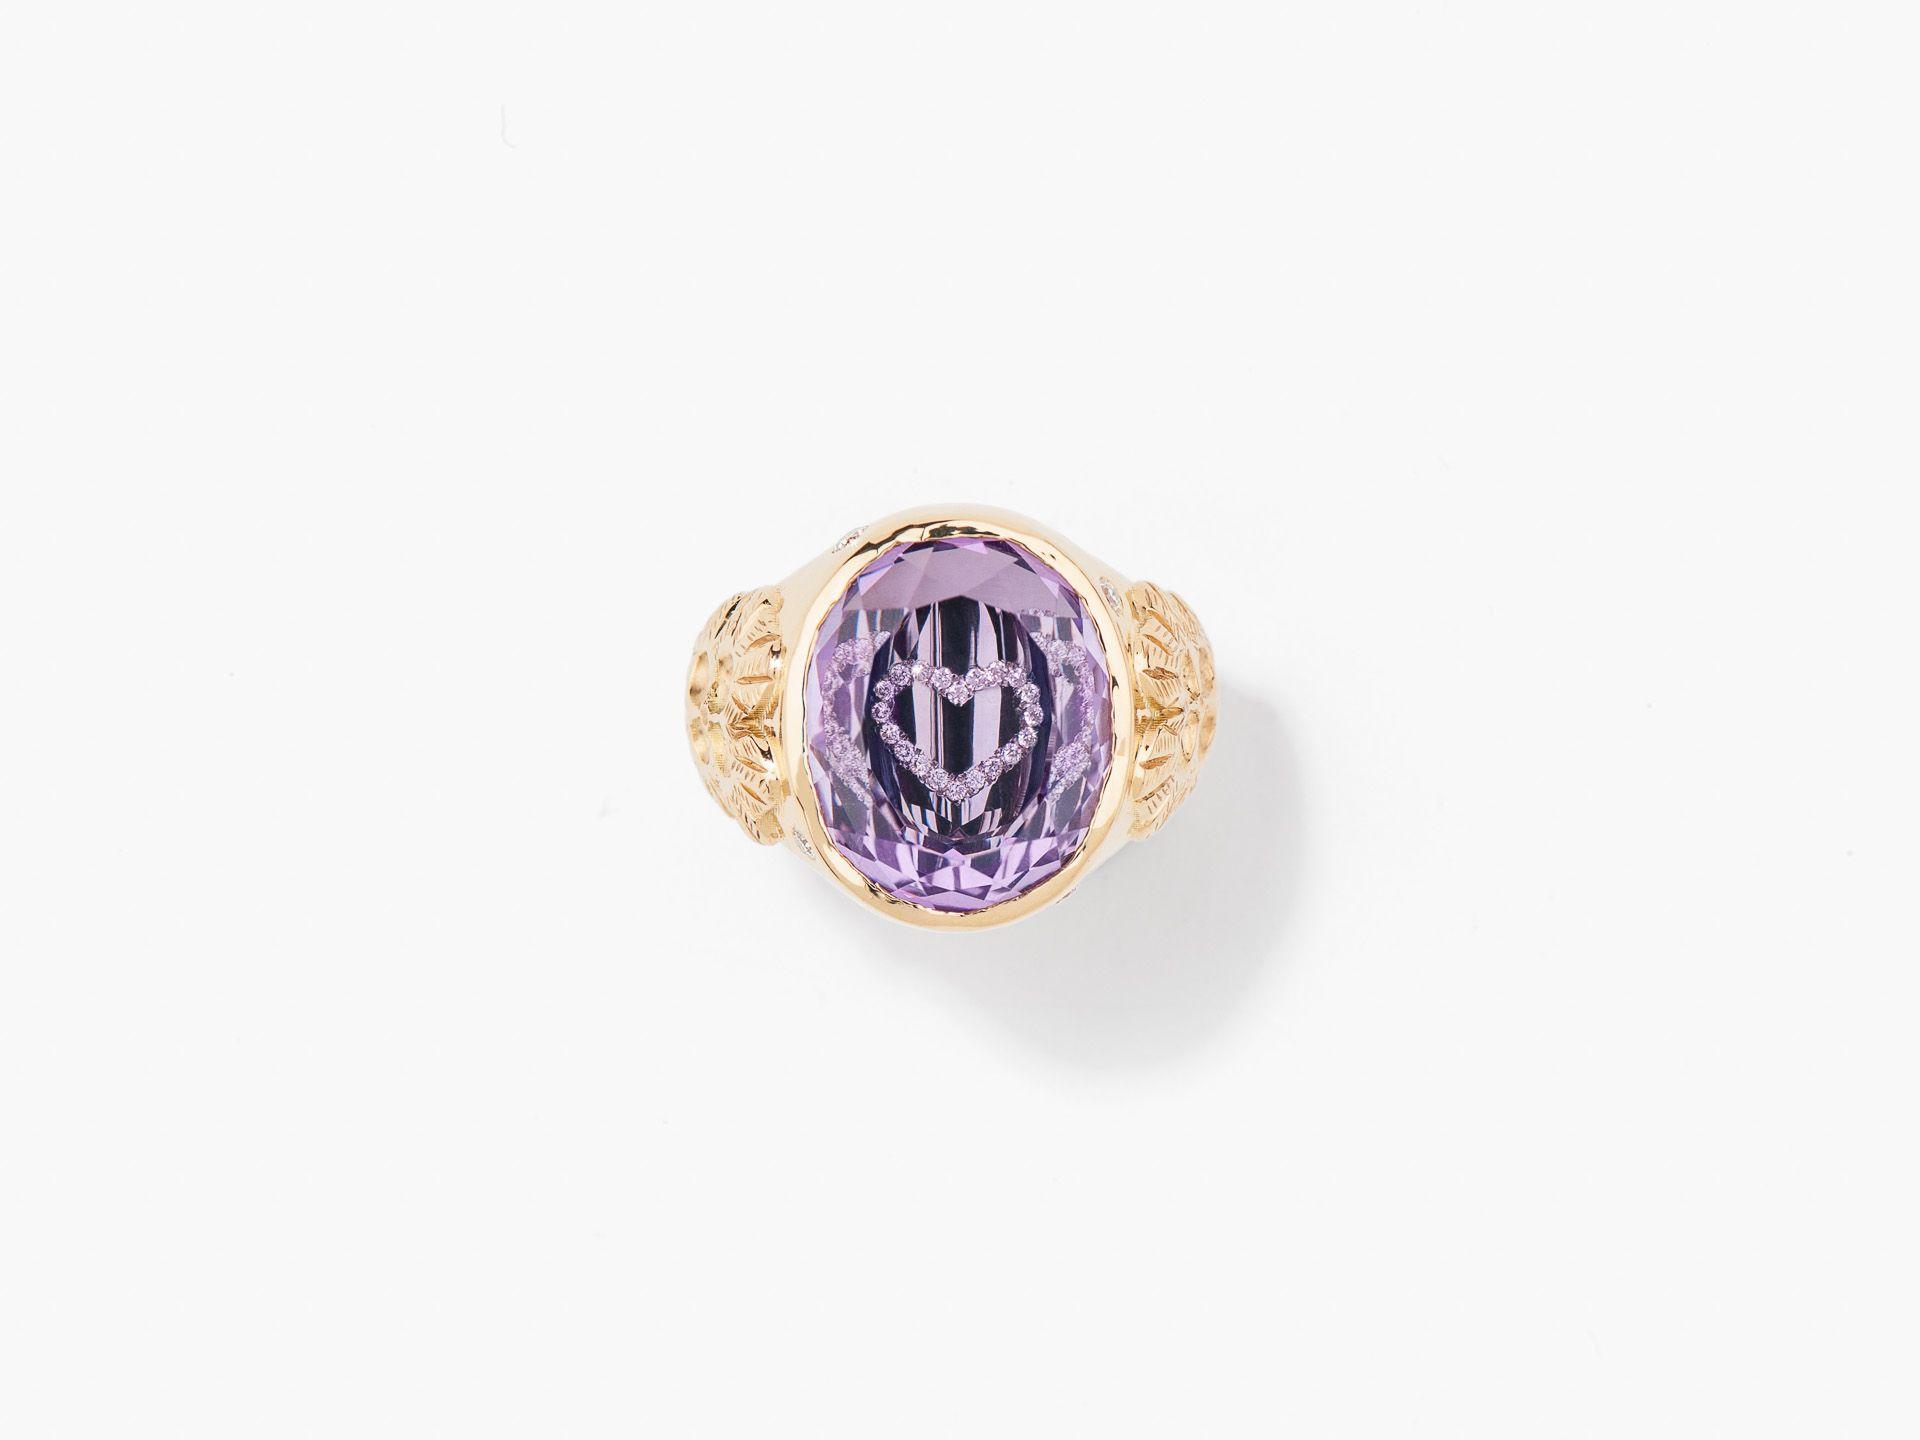 Rose de France & Diamond signet ring Aurélie Bidermann from Fine Jewelry Line